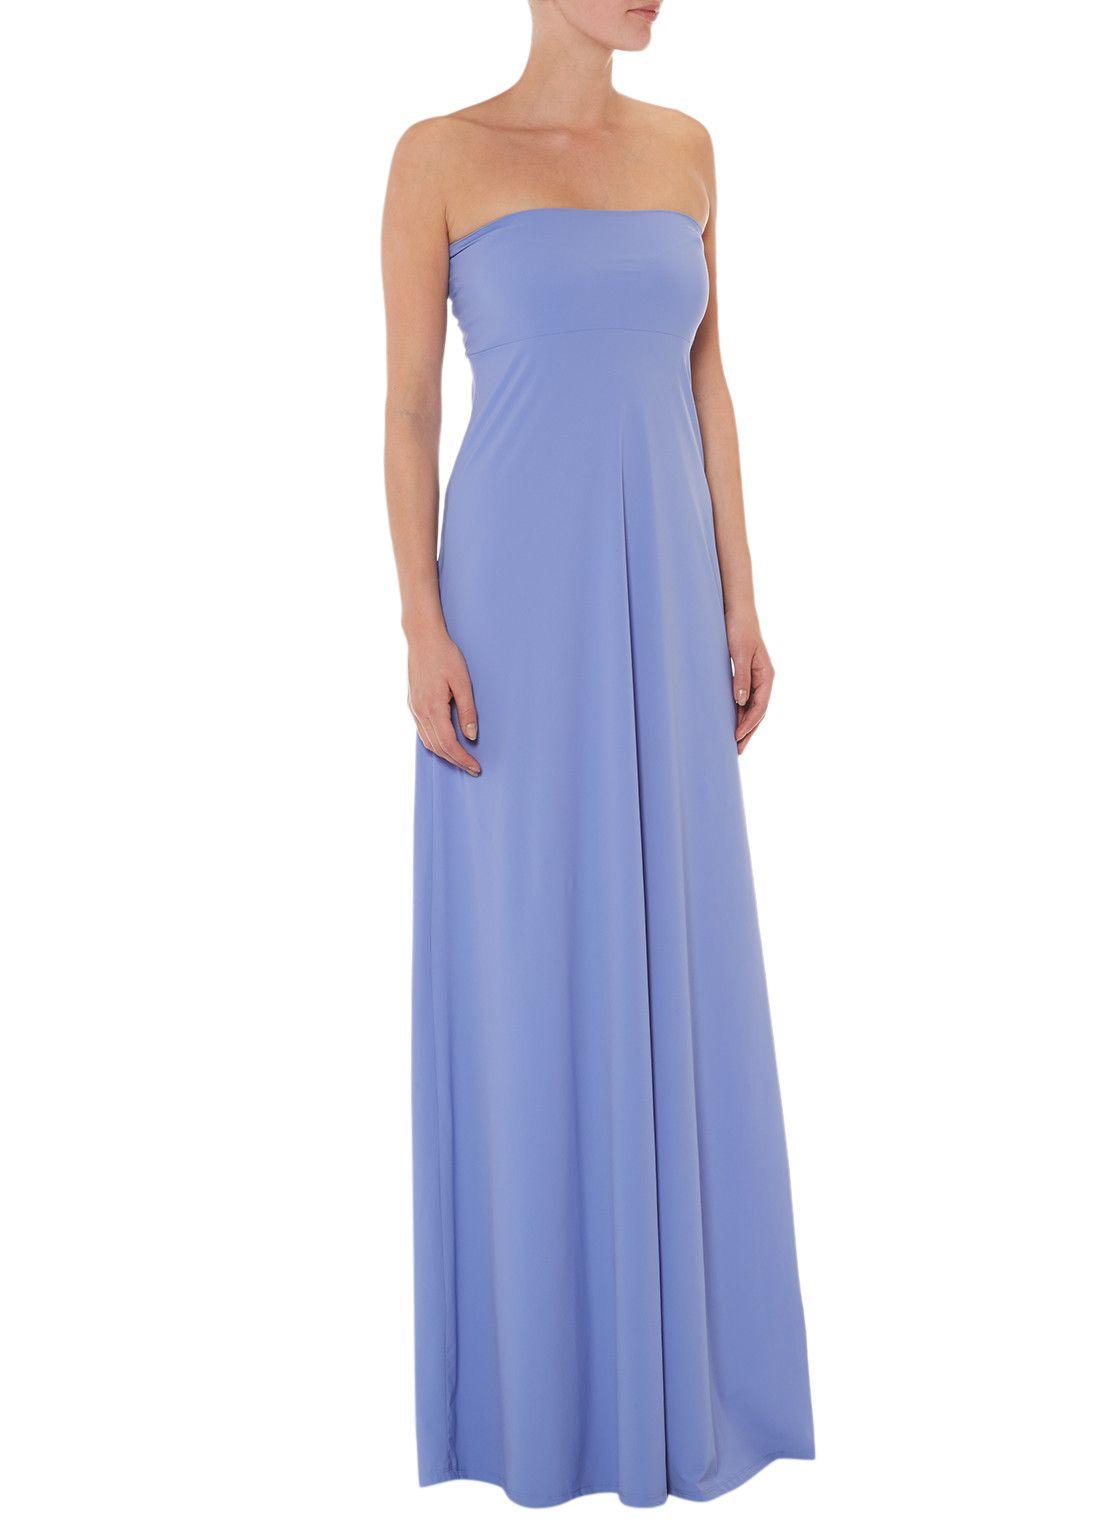 Strapless maxi jurk blauw